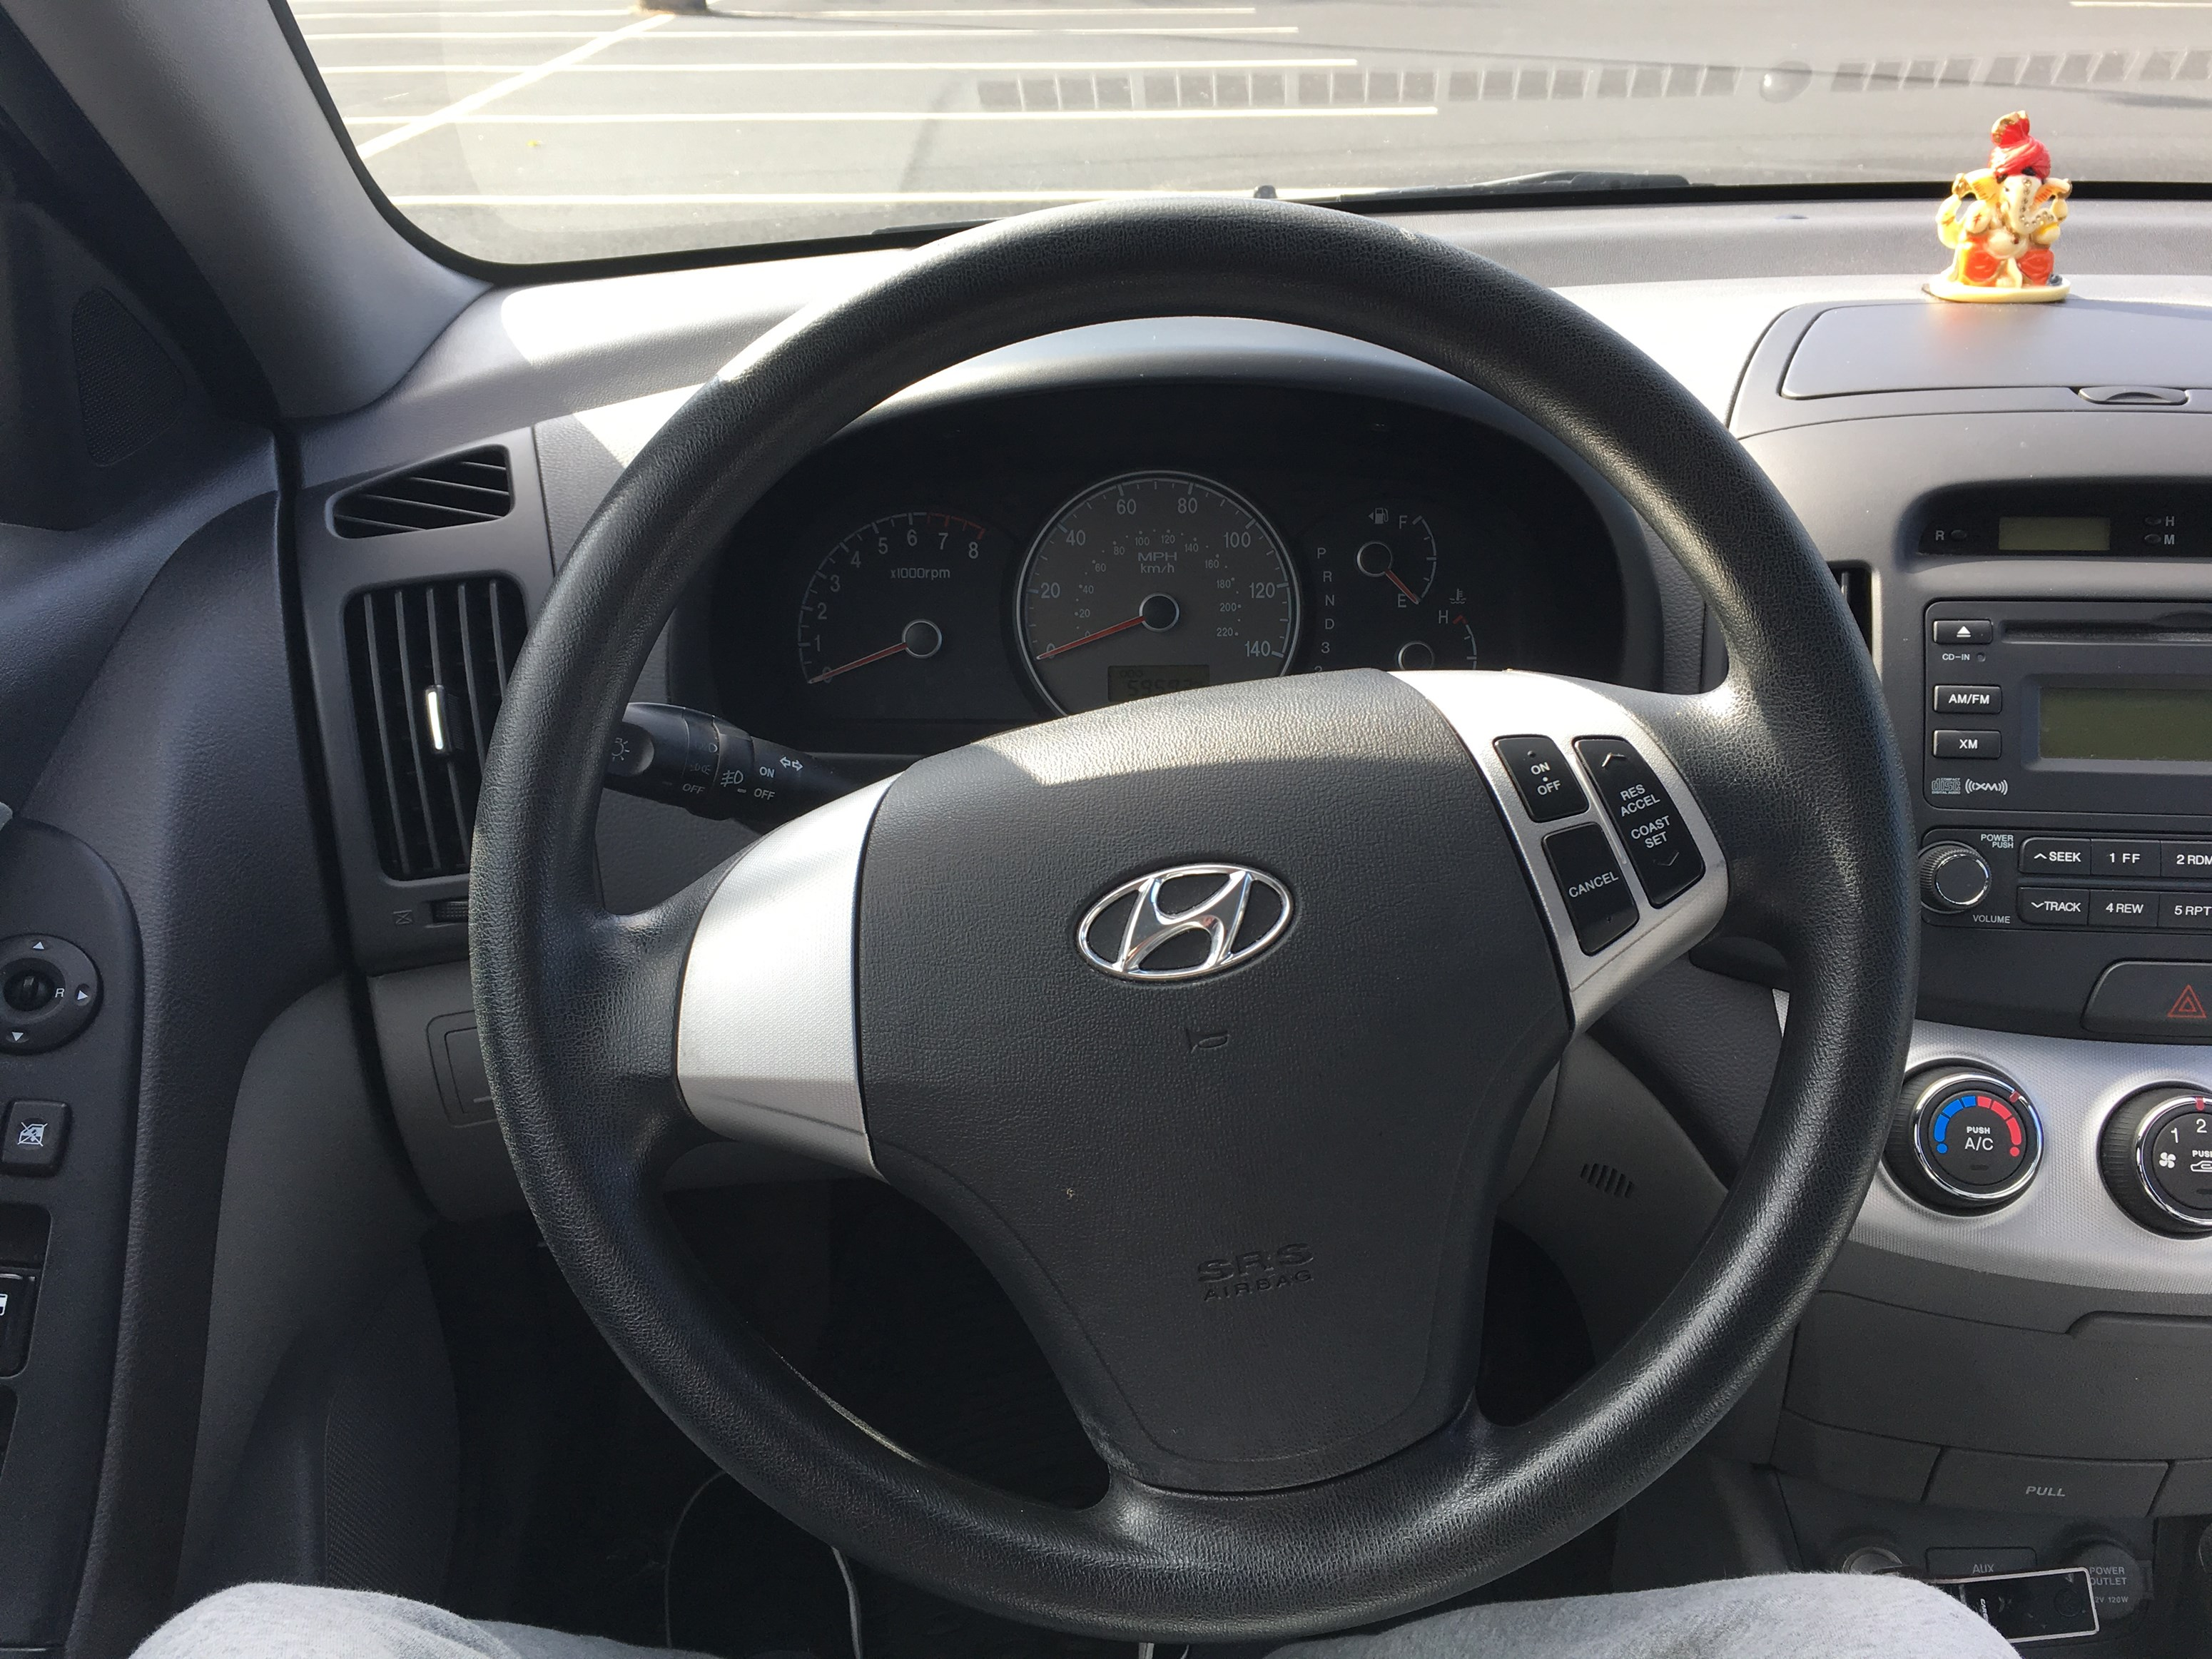 2008 Hyundai Elantra Low Mileage $5200 OBO Used Hyundai Elantra